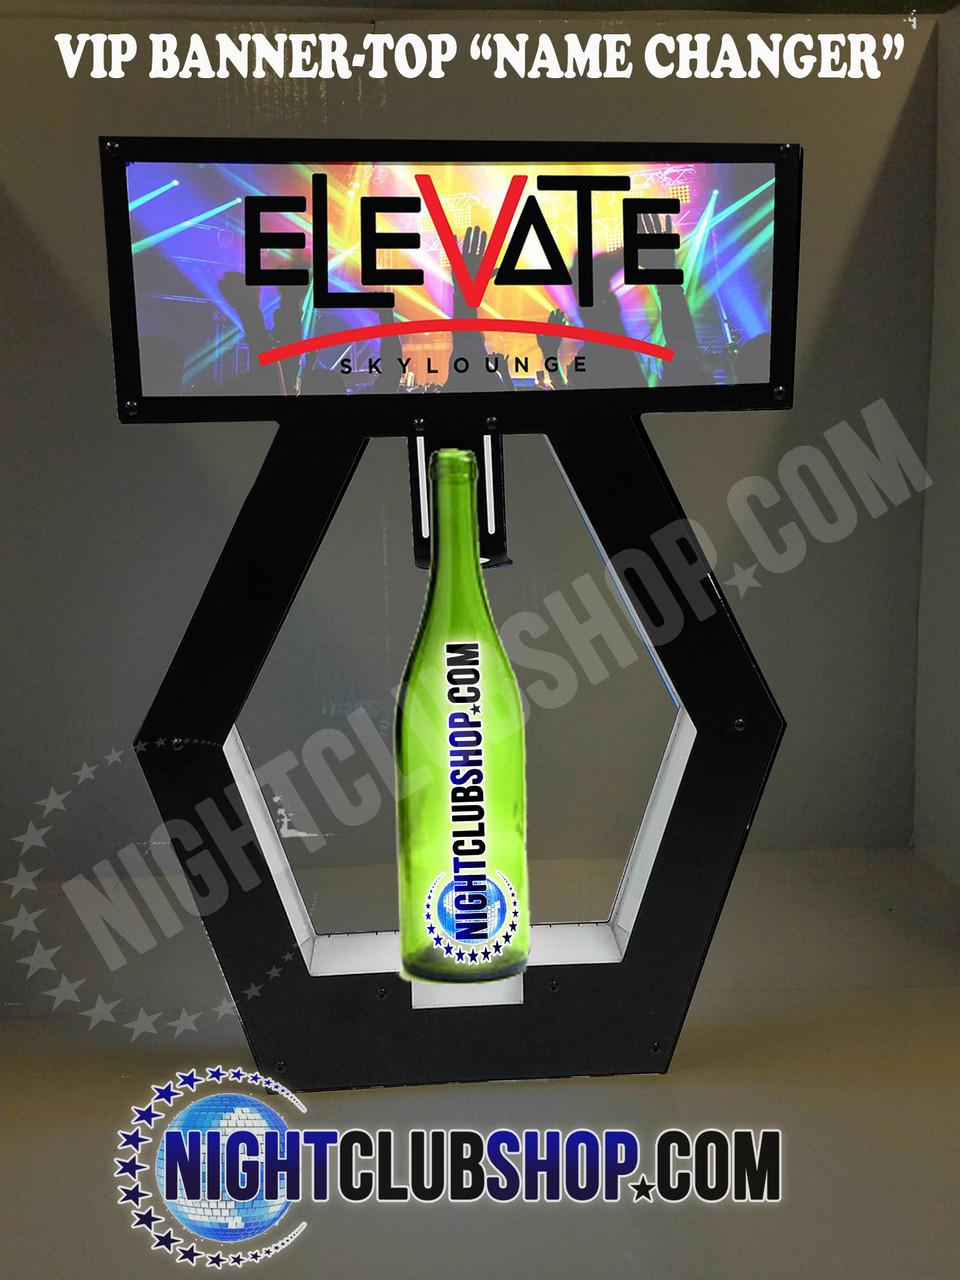 Nightclub_VIP_Lightbox_Champagne_Liquor_Tray_interchangeable_Bottle_service_carrier_holder_tray_Presenter_caddie_caddy_Banner_Top_Illuminated